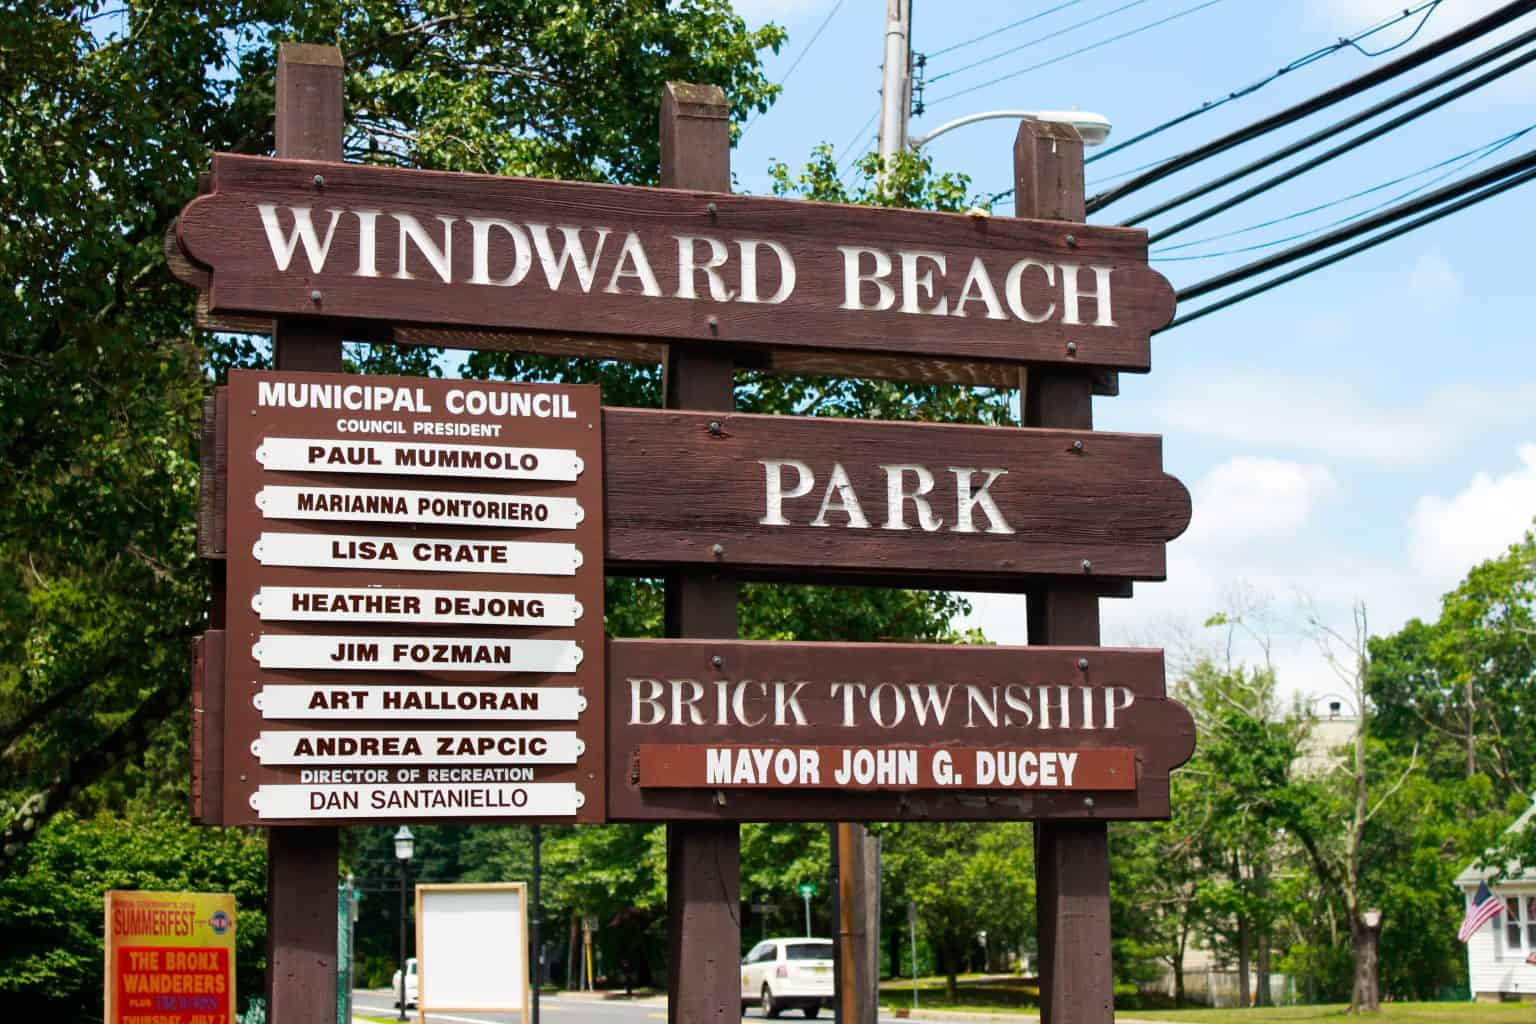 windward-beach-park-playground-brick-nj_28266702355_o-1536x1024